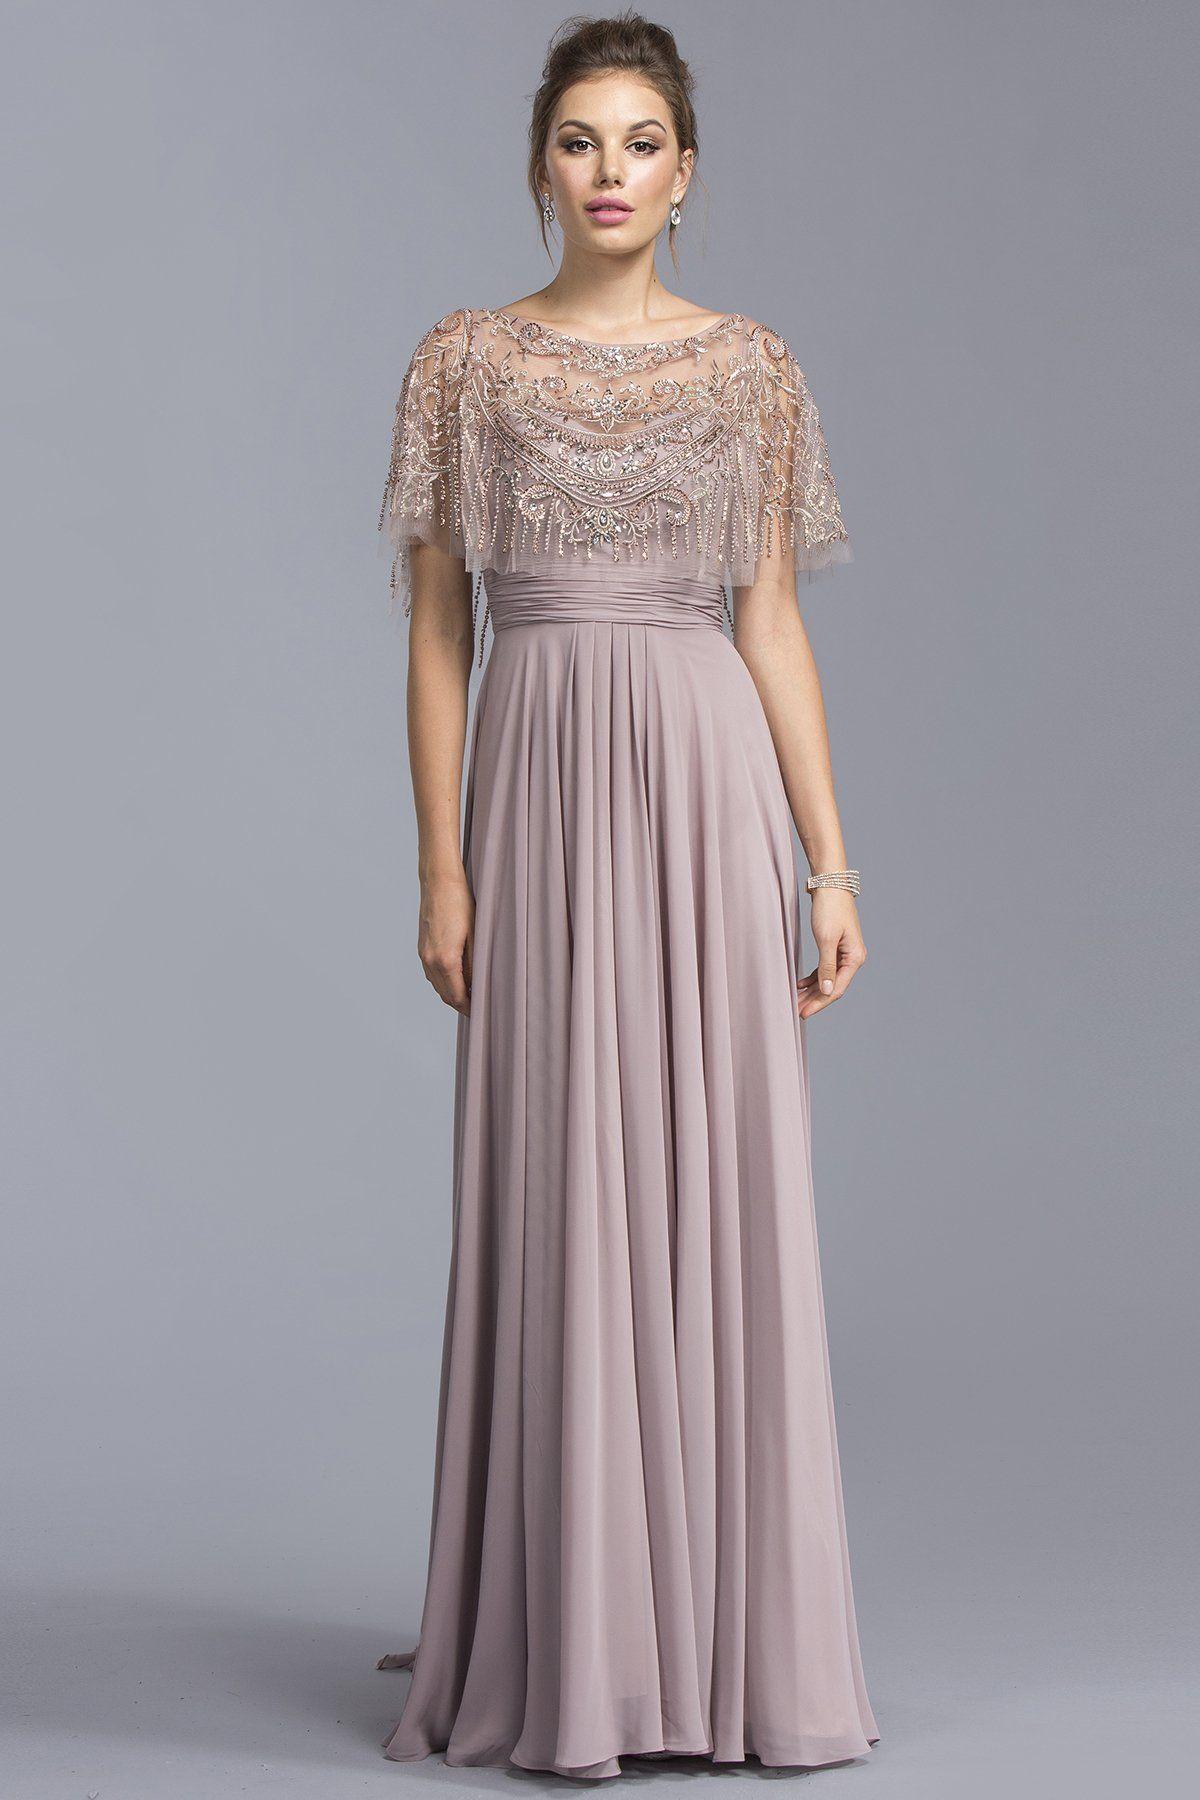 6455ba0be6d Soft Illusion Long Formal Dresses With Mantle APM2070